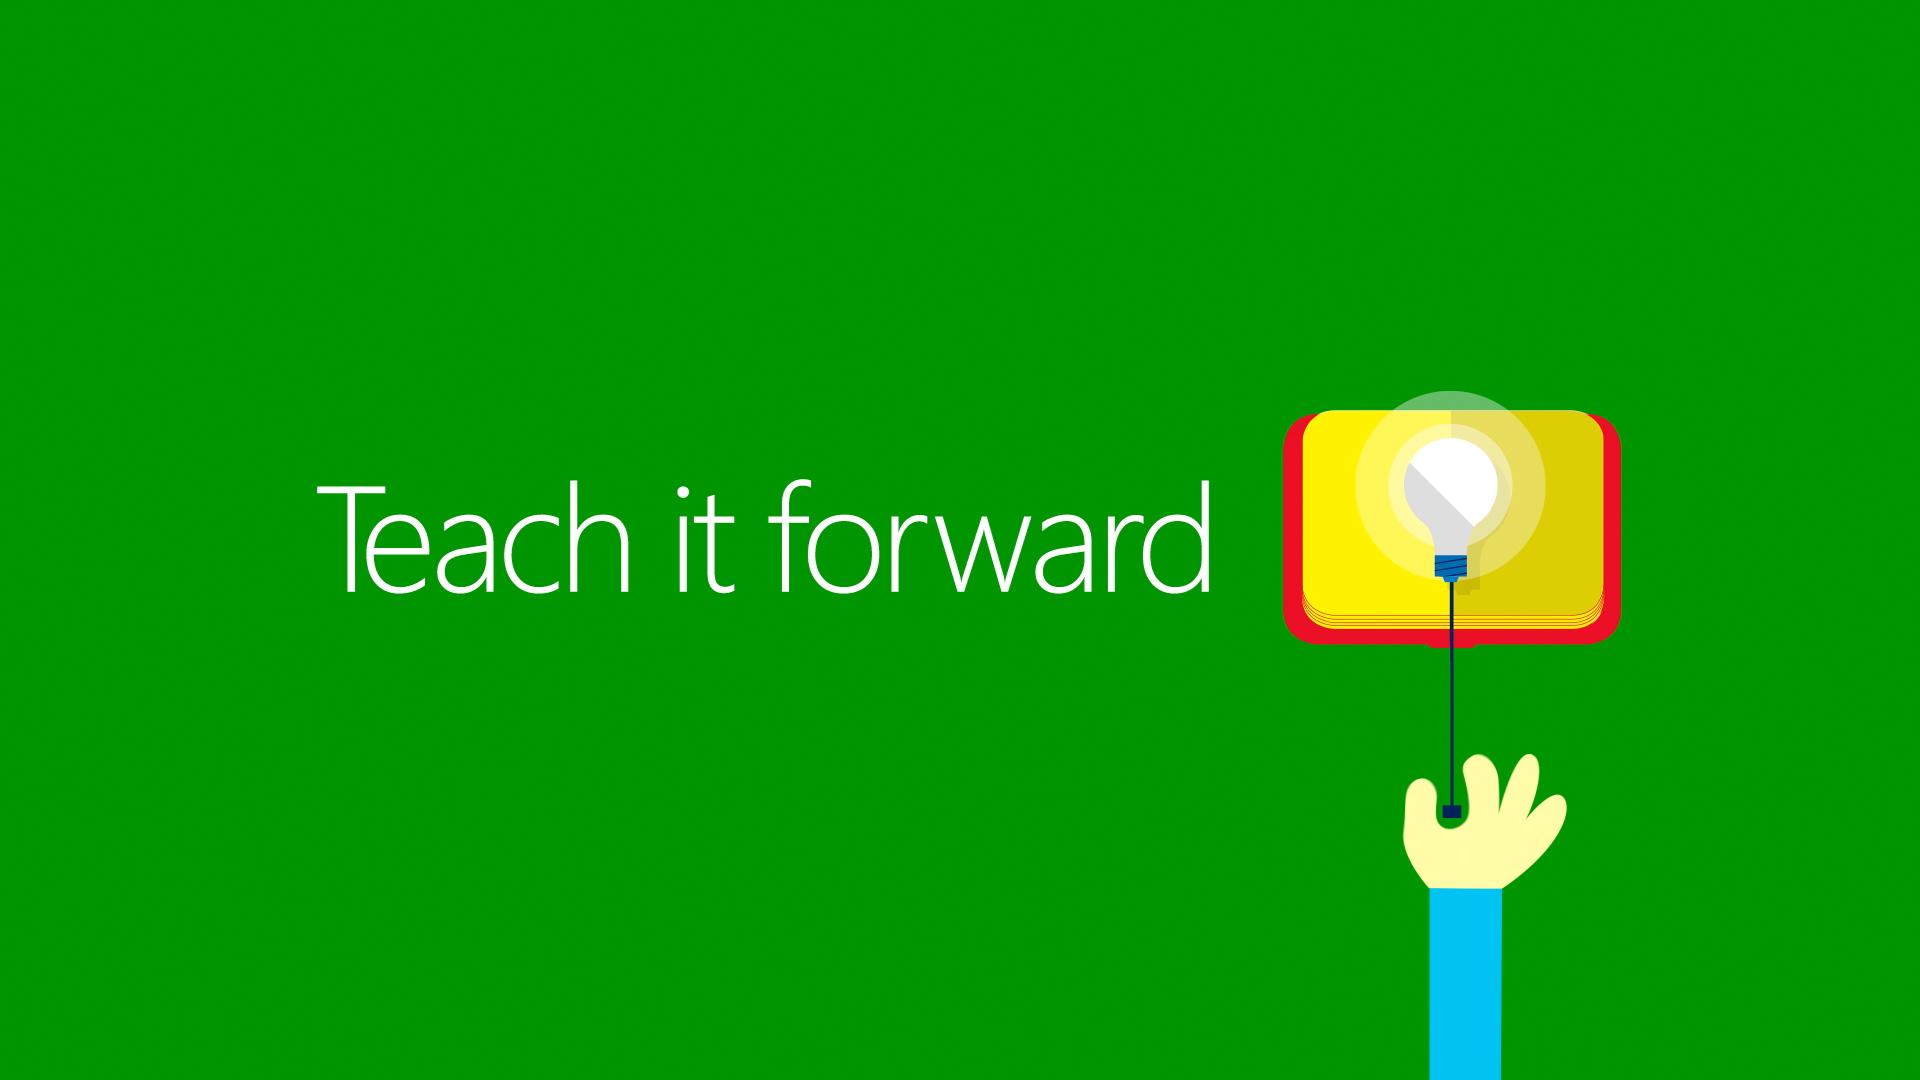 Teach-it-forward-tn-8.jpg